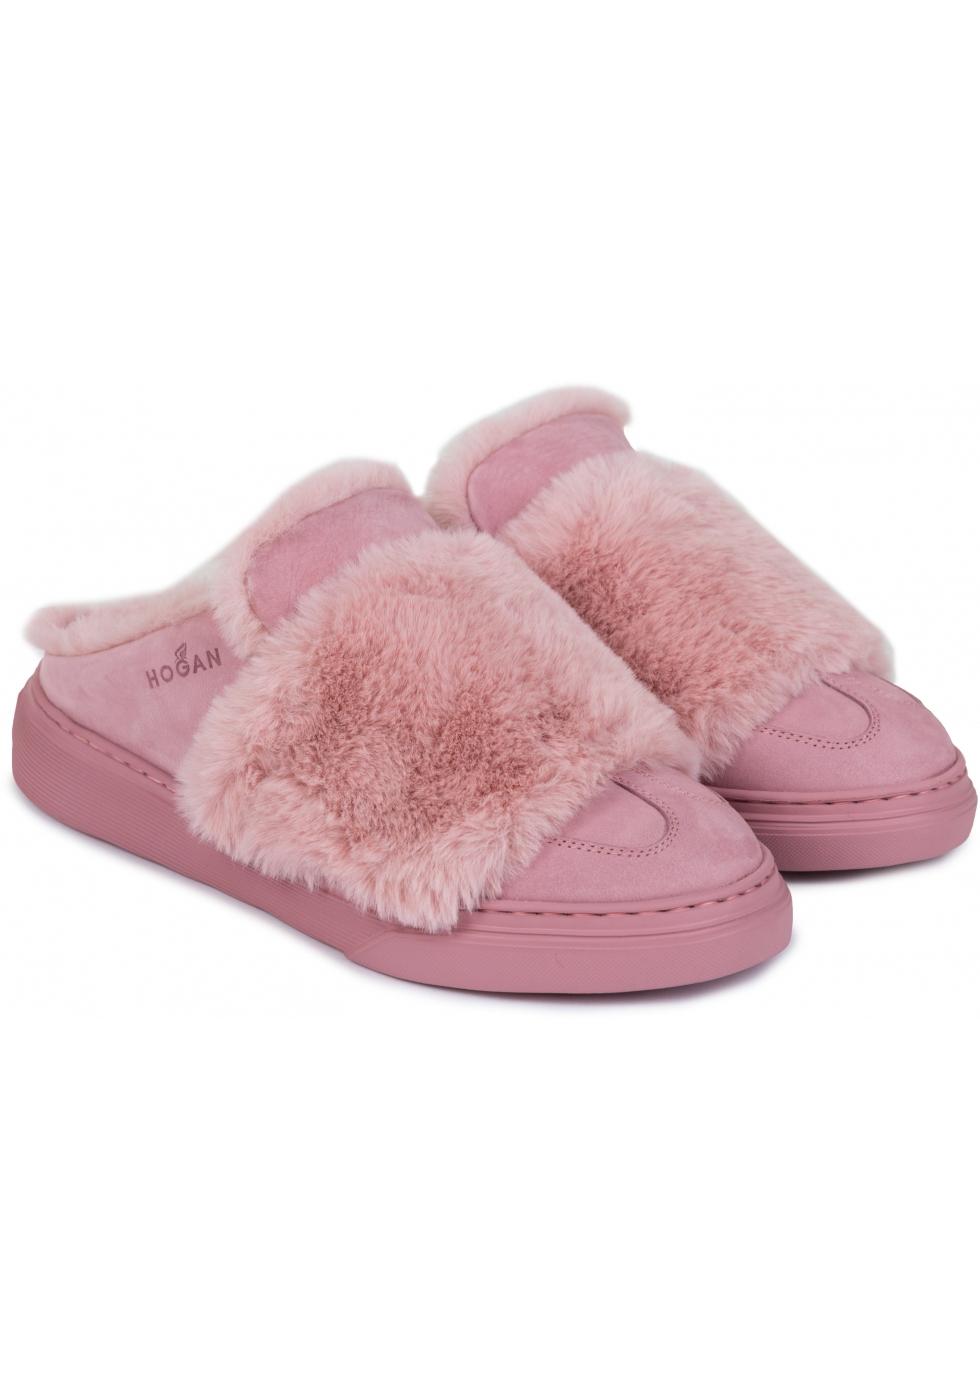 Ciabatte invernali donna Hogan in pelle e pelliccia rosa - Italian ...